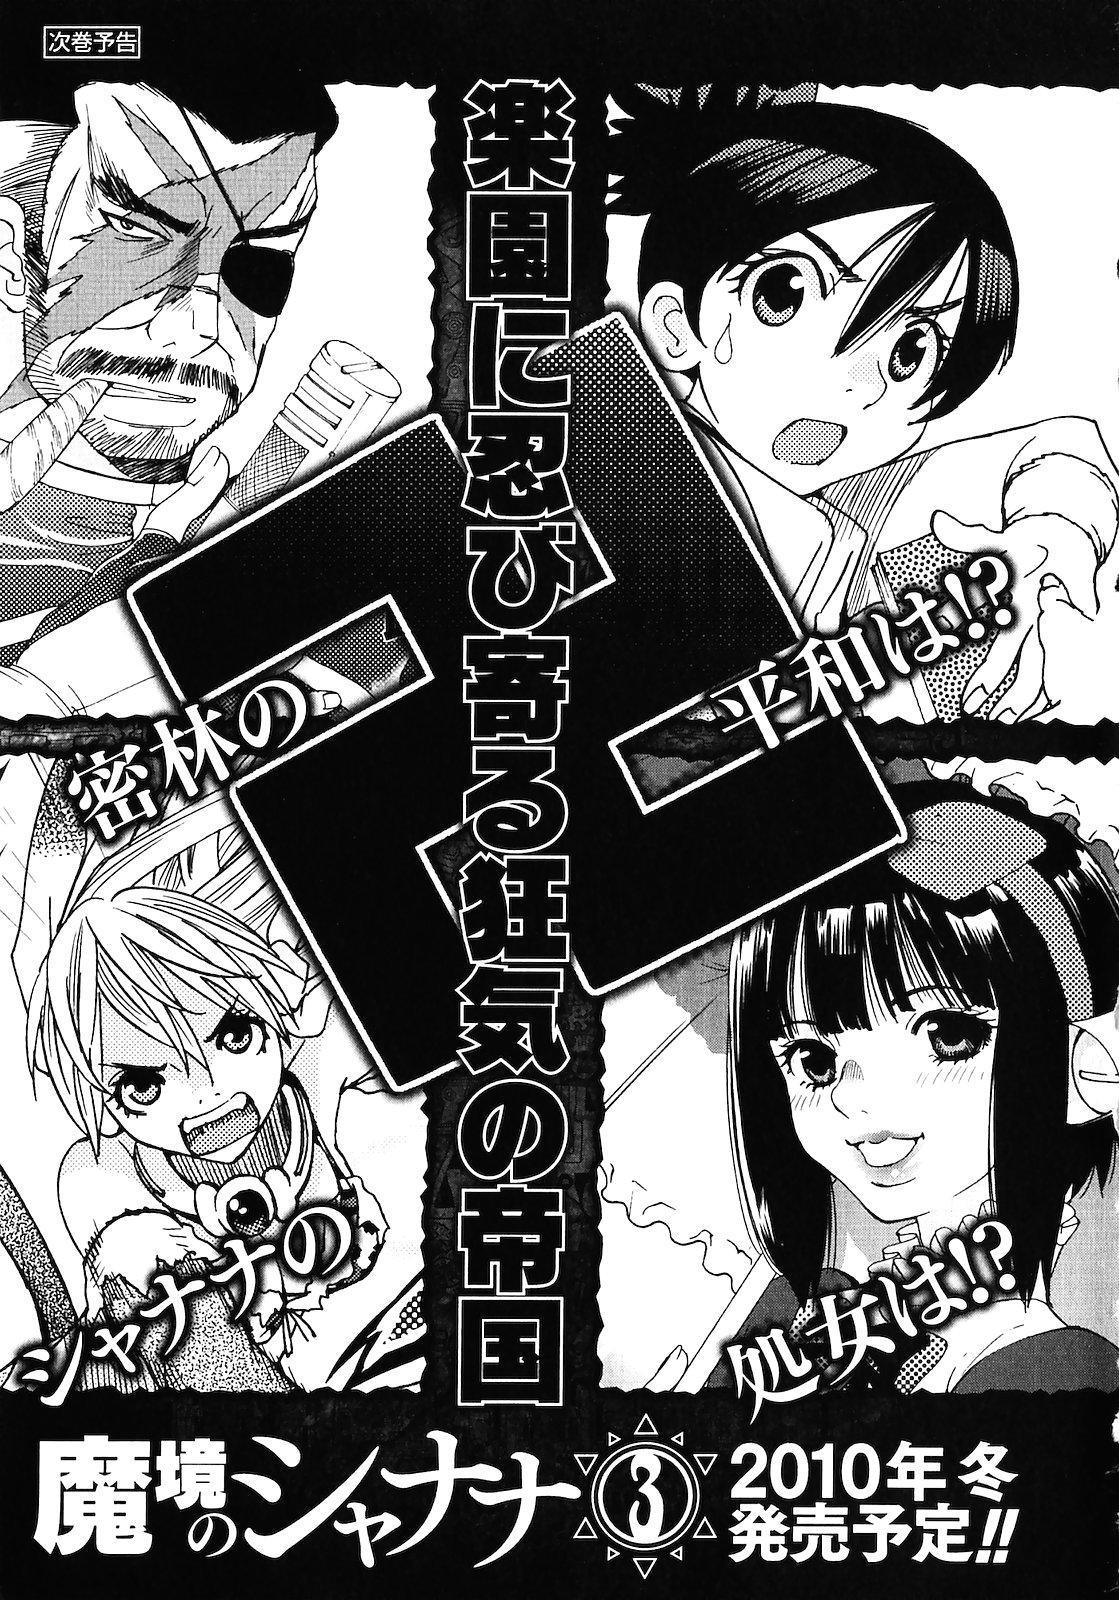 Makyo no Shanana Vol.02 192